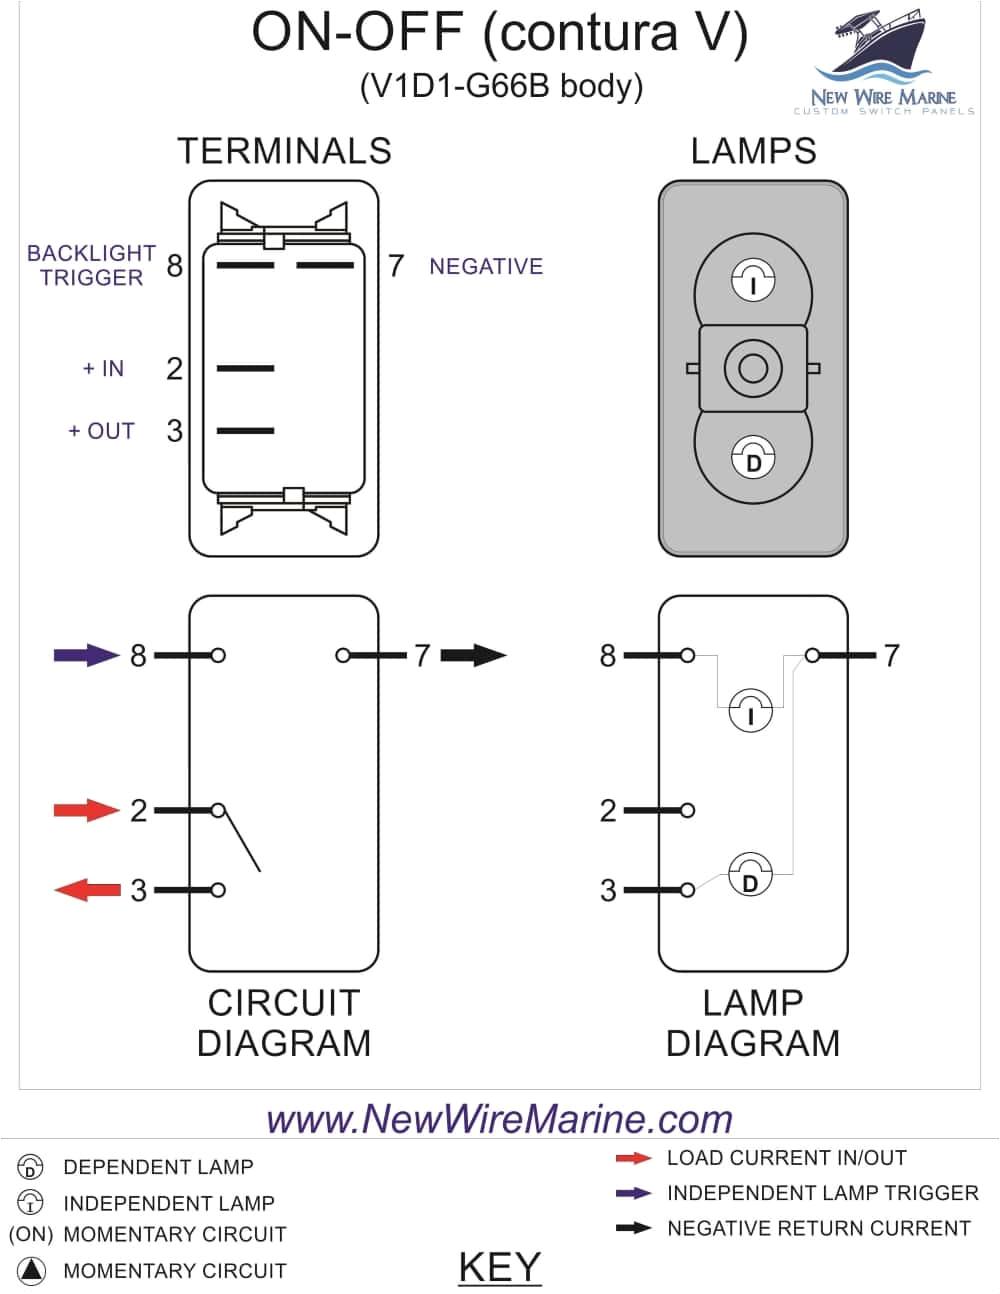 12 volt rocker wiring diagram free picture blog wiring diagram pin dpdt switch circuit diagrams on pinterest